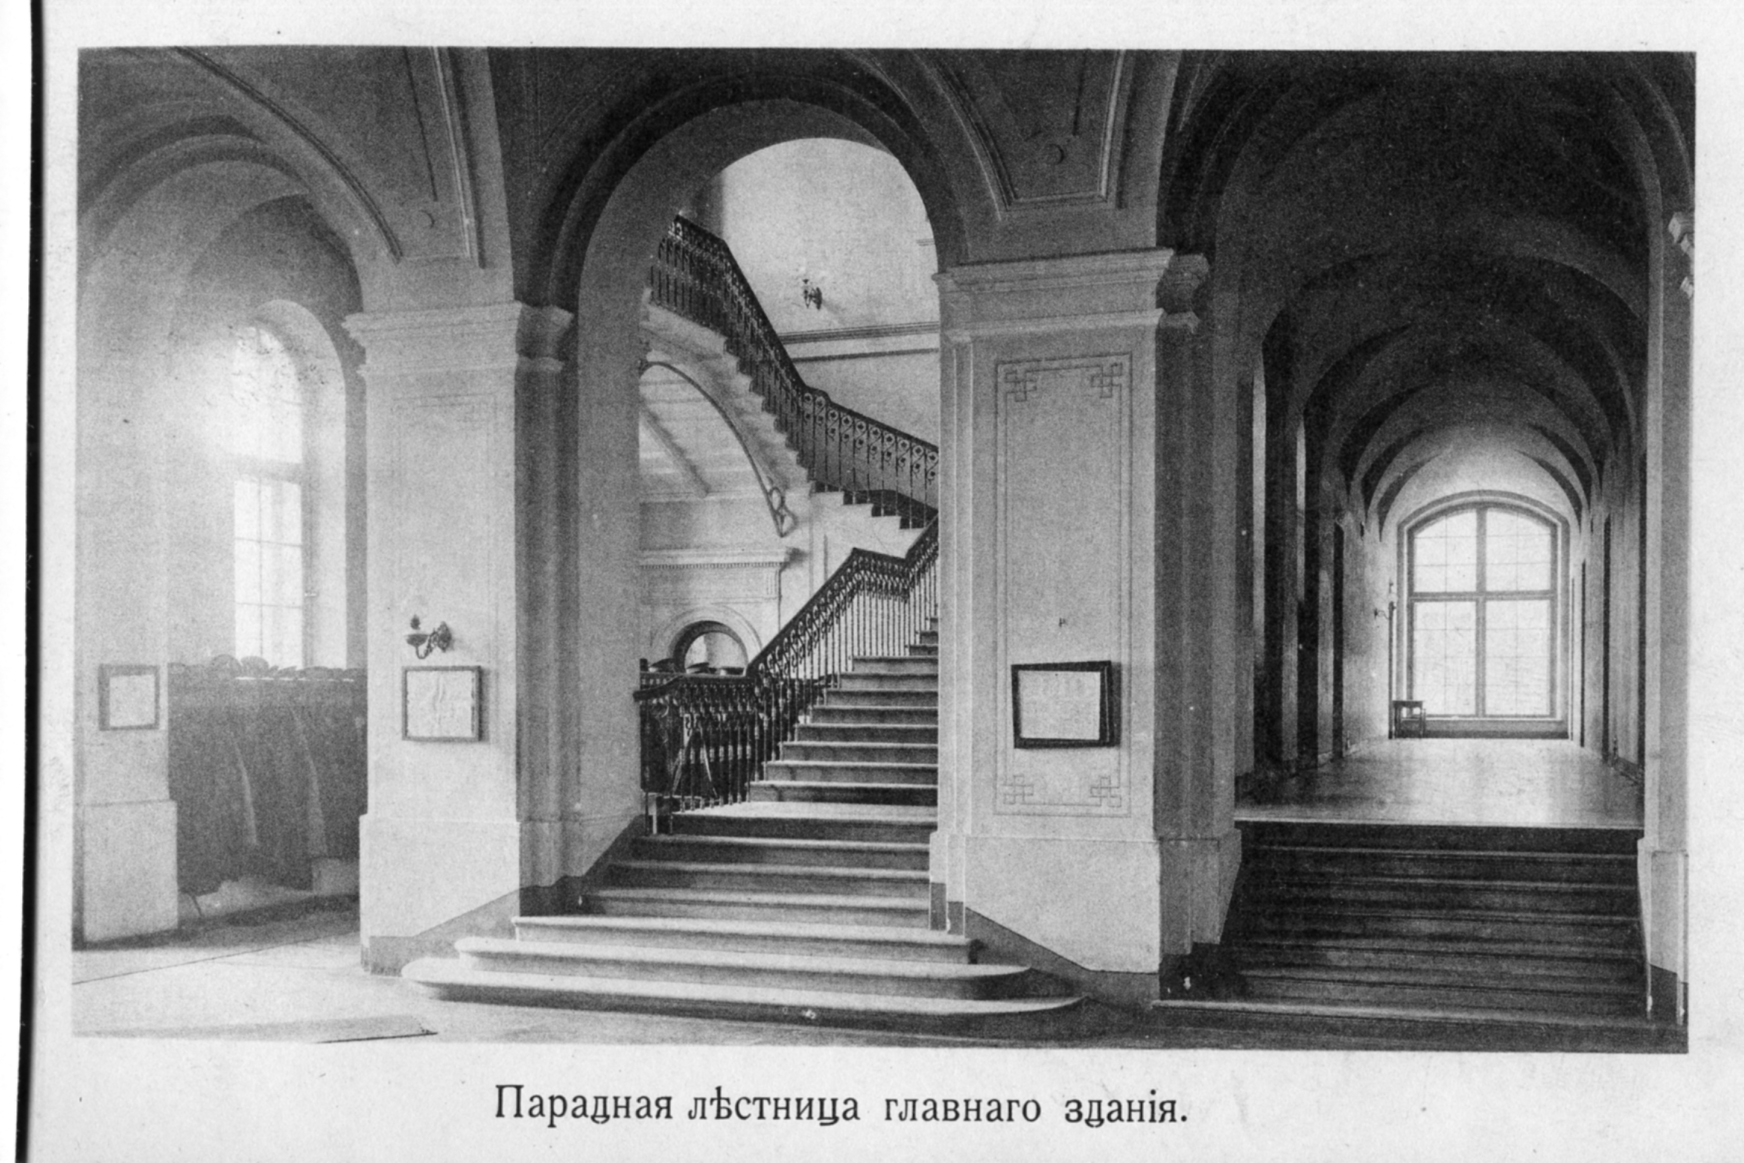 Парадный холл аудиторного корпуса